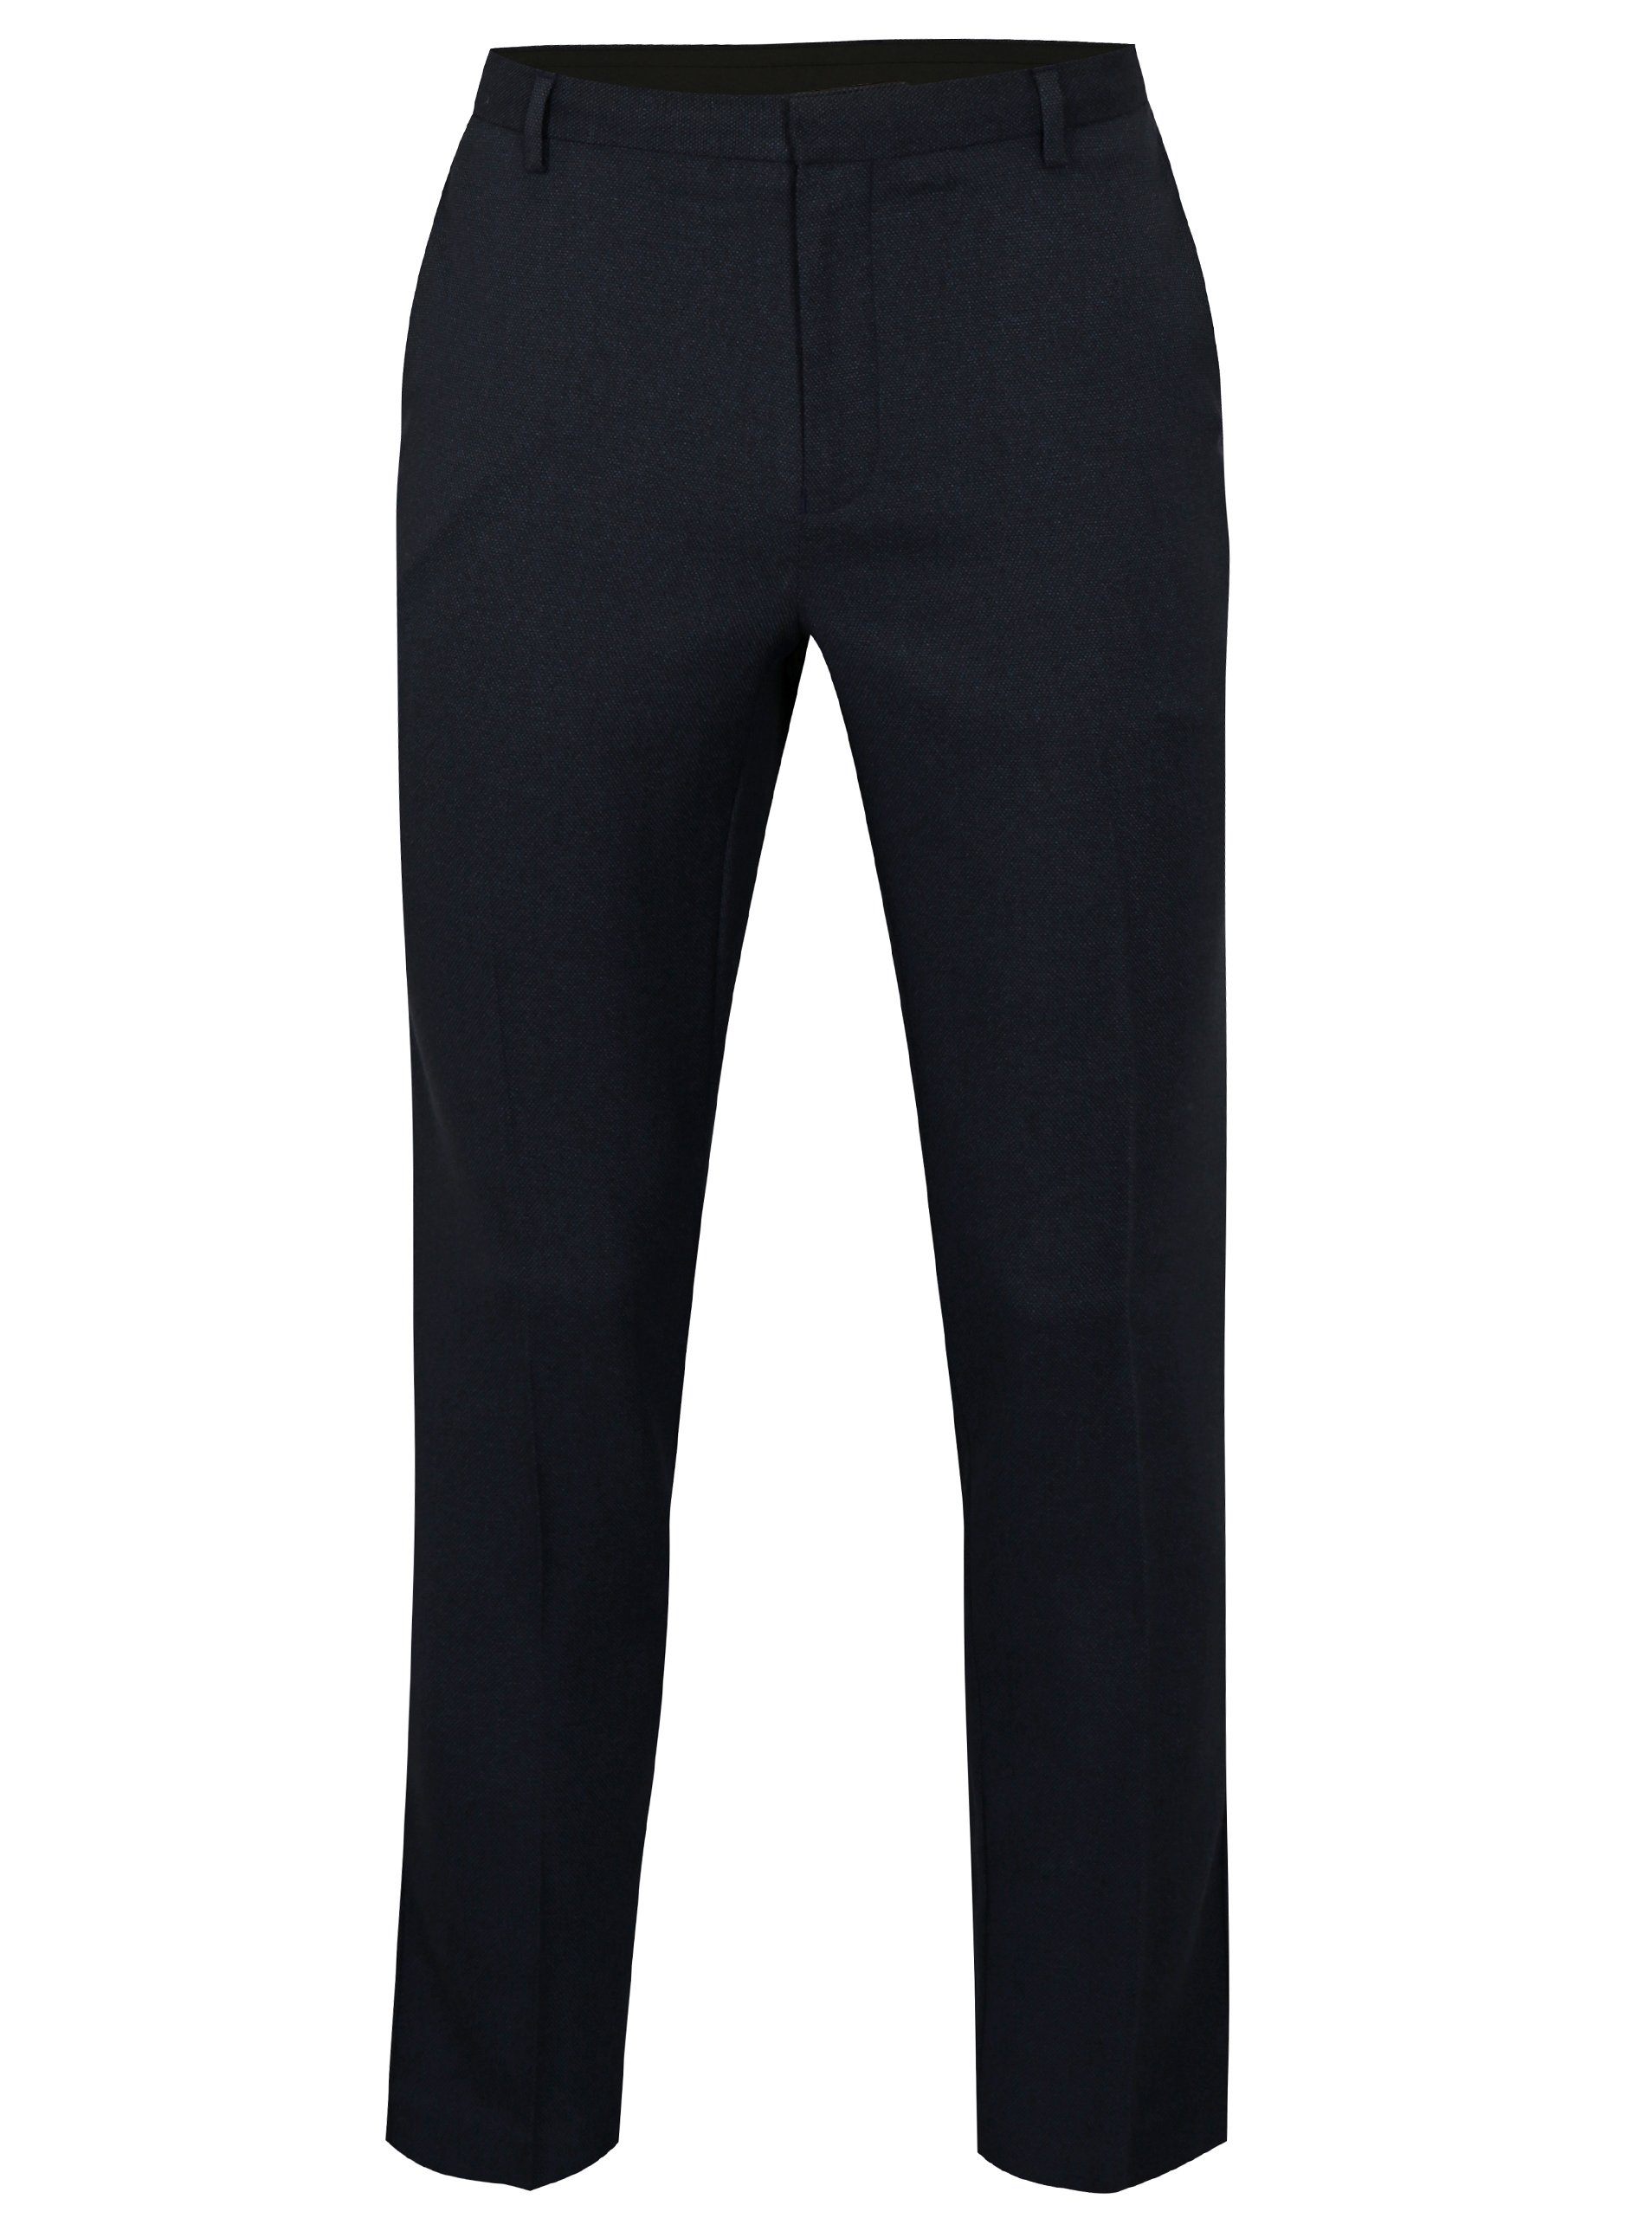 9879fbeb0e Tmavomodré slim fit nohavice Burton Menswear London